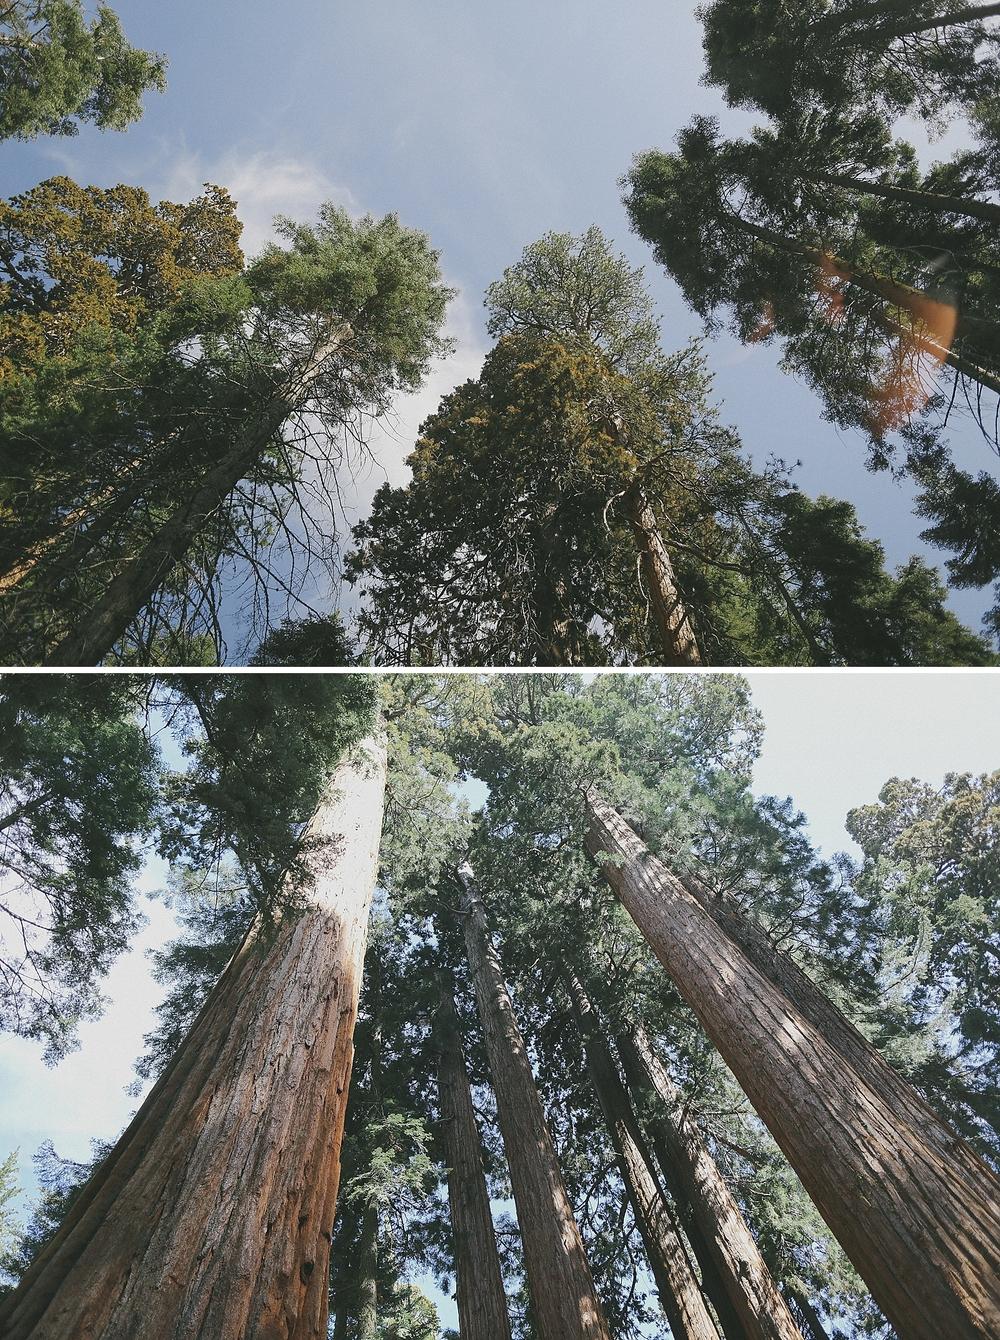 Visalia California Photographer - Patty Lagera